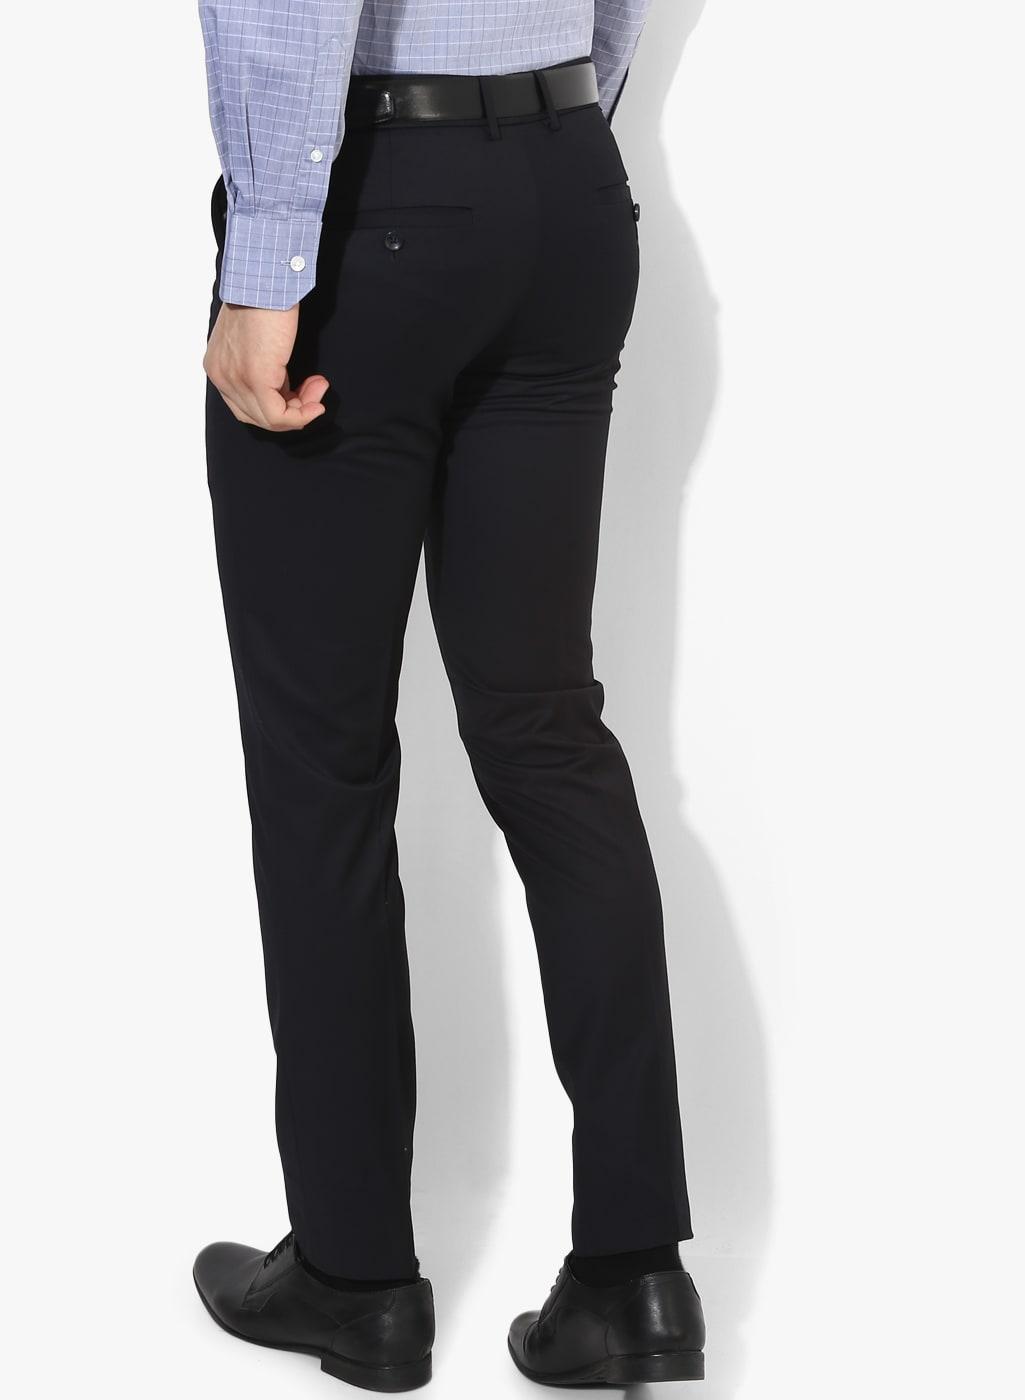 62e4e974dbc0 Men Trousers Formal Trousers - Buy Men Trousers Formal Trousers online in  India - Jabong